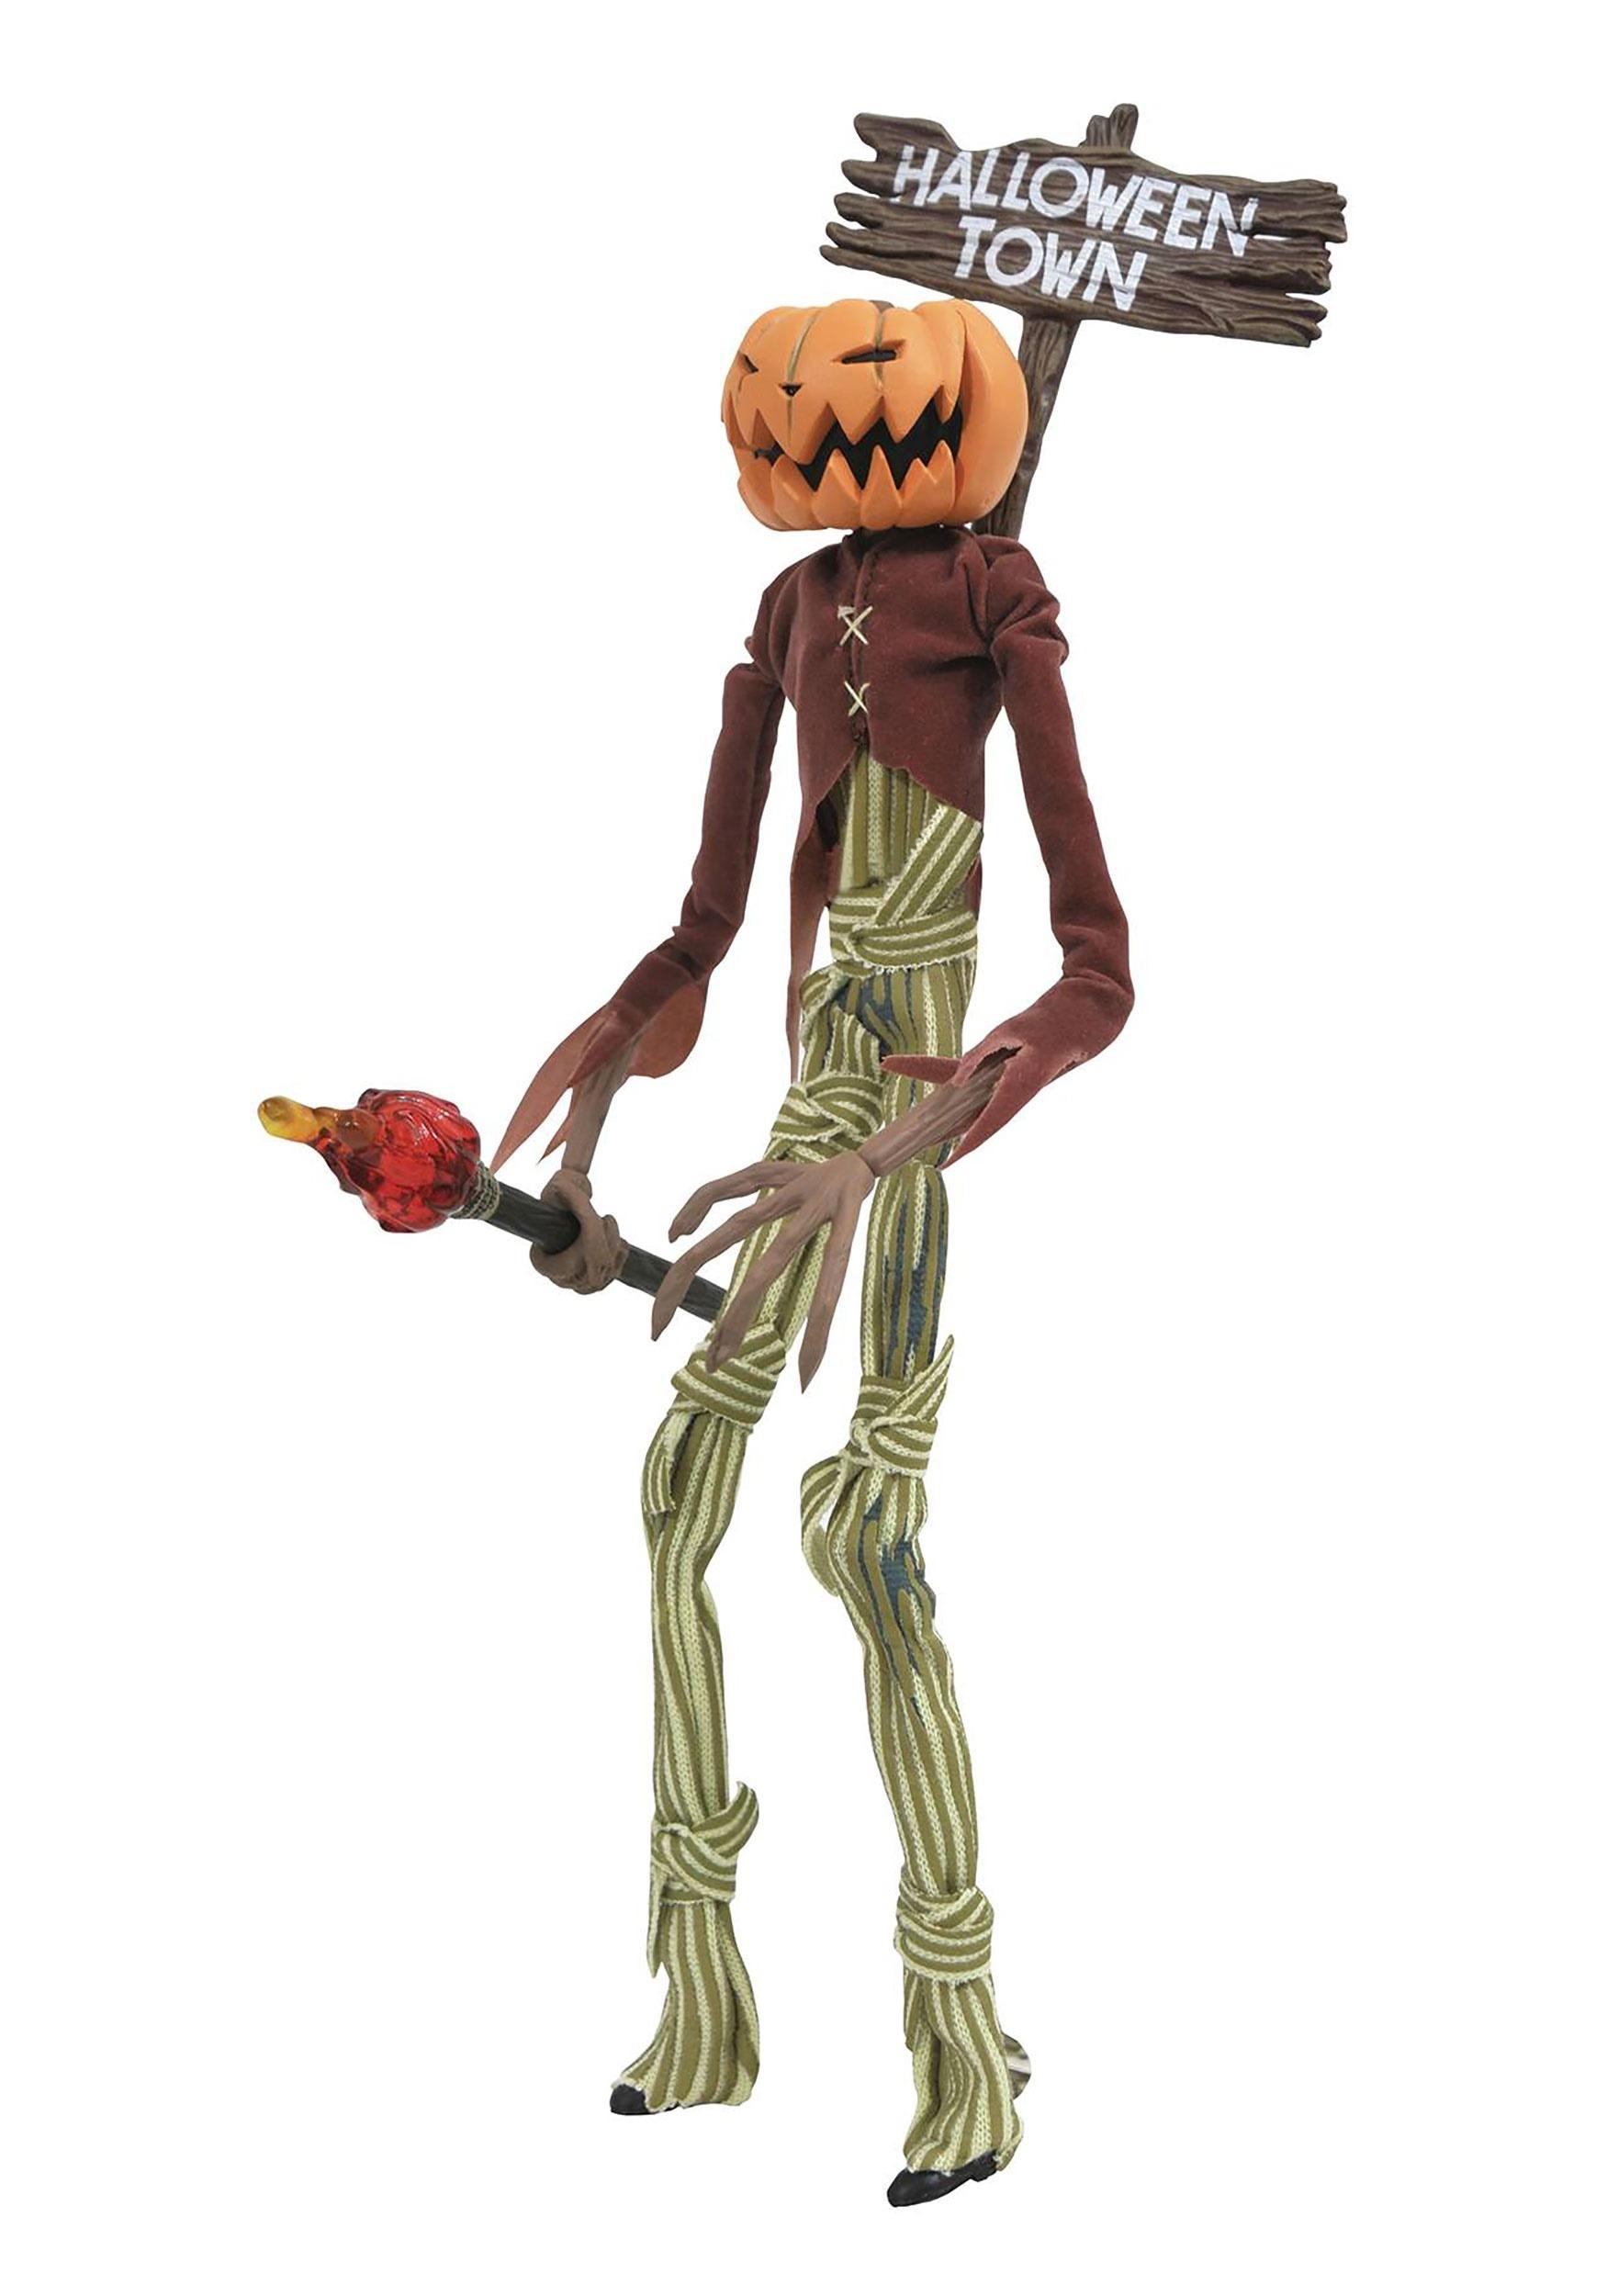 Pumpkin King Jack Nightmare Before Christmas Silver Anniversary Figure